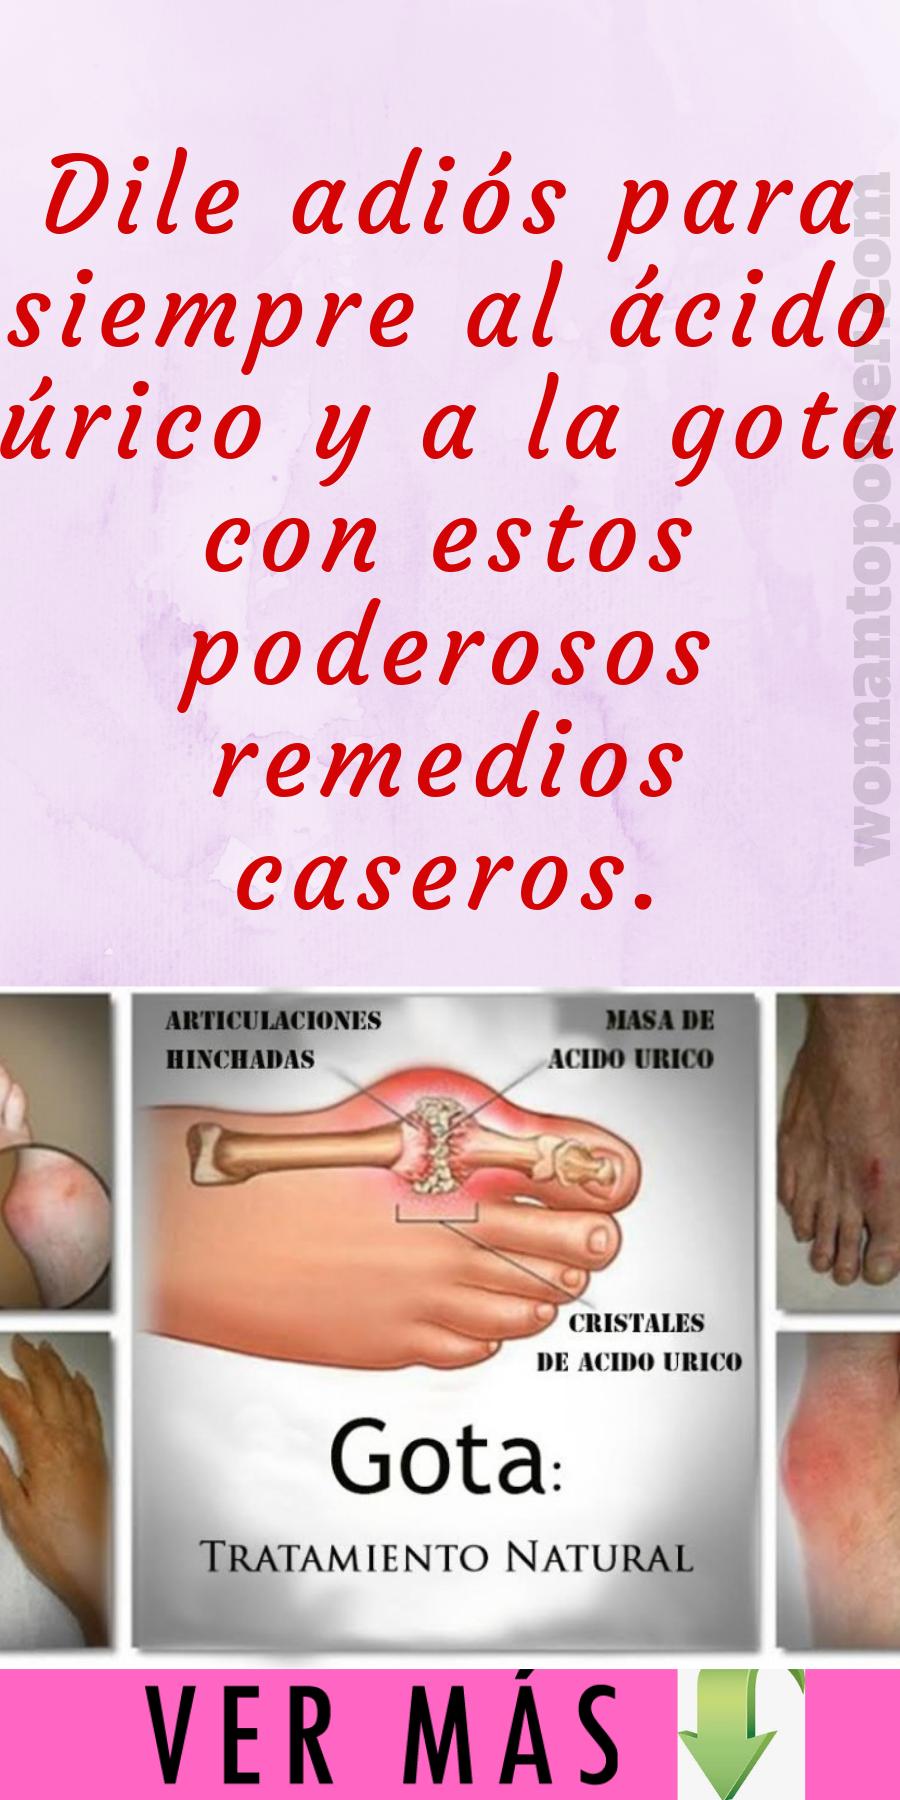 ácido urico tratamiento natural